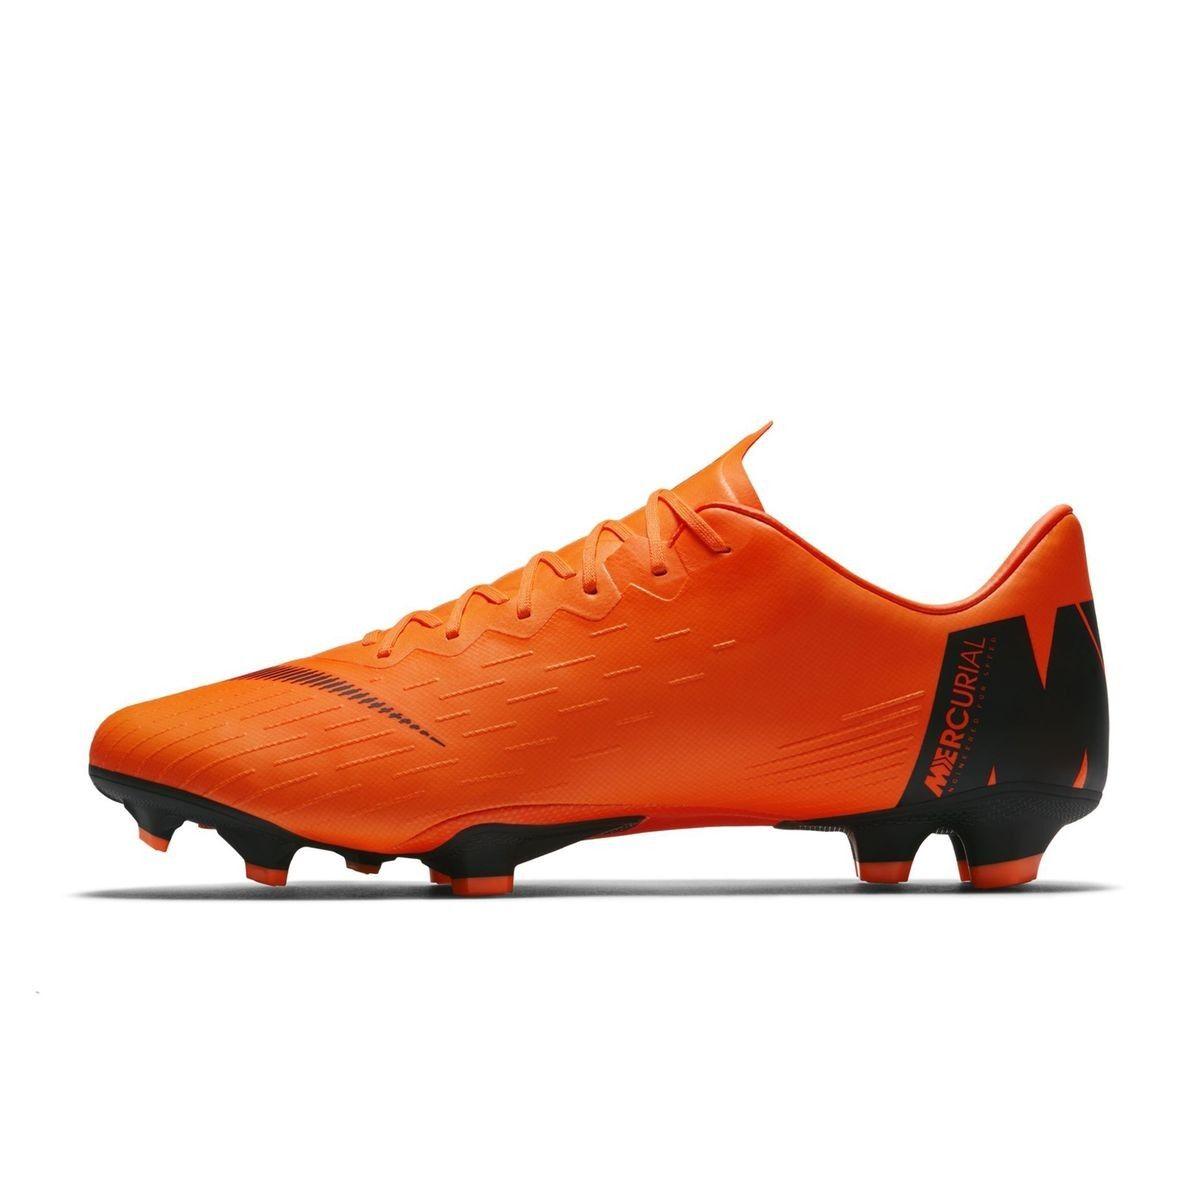 Chaussures football Nike Mercurial Vapor XII Pro FG Orange